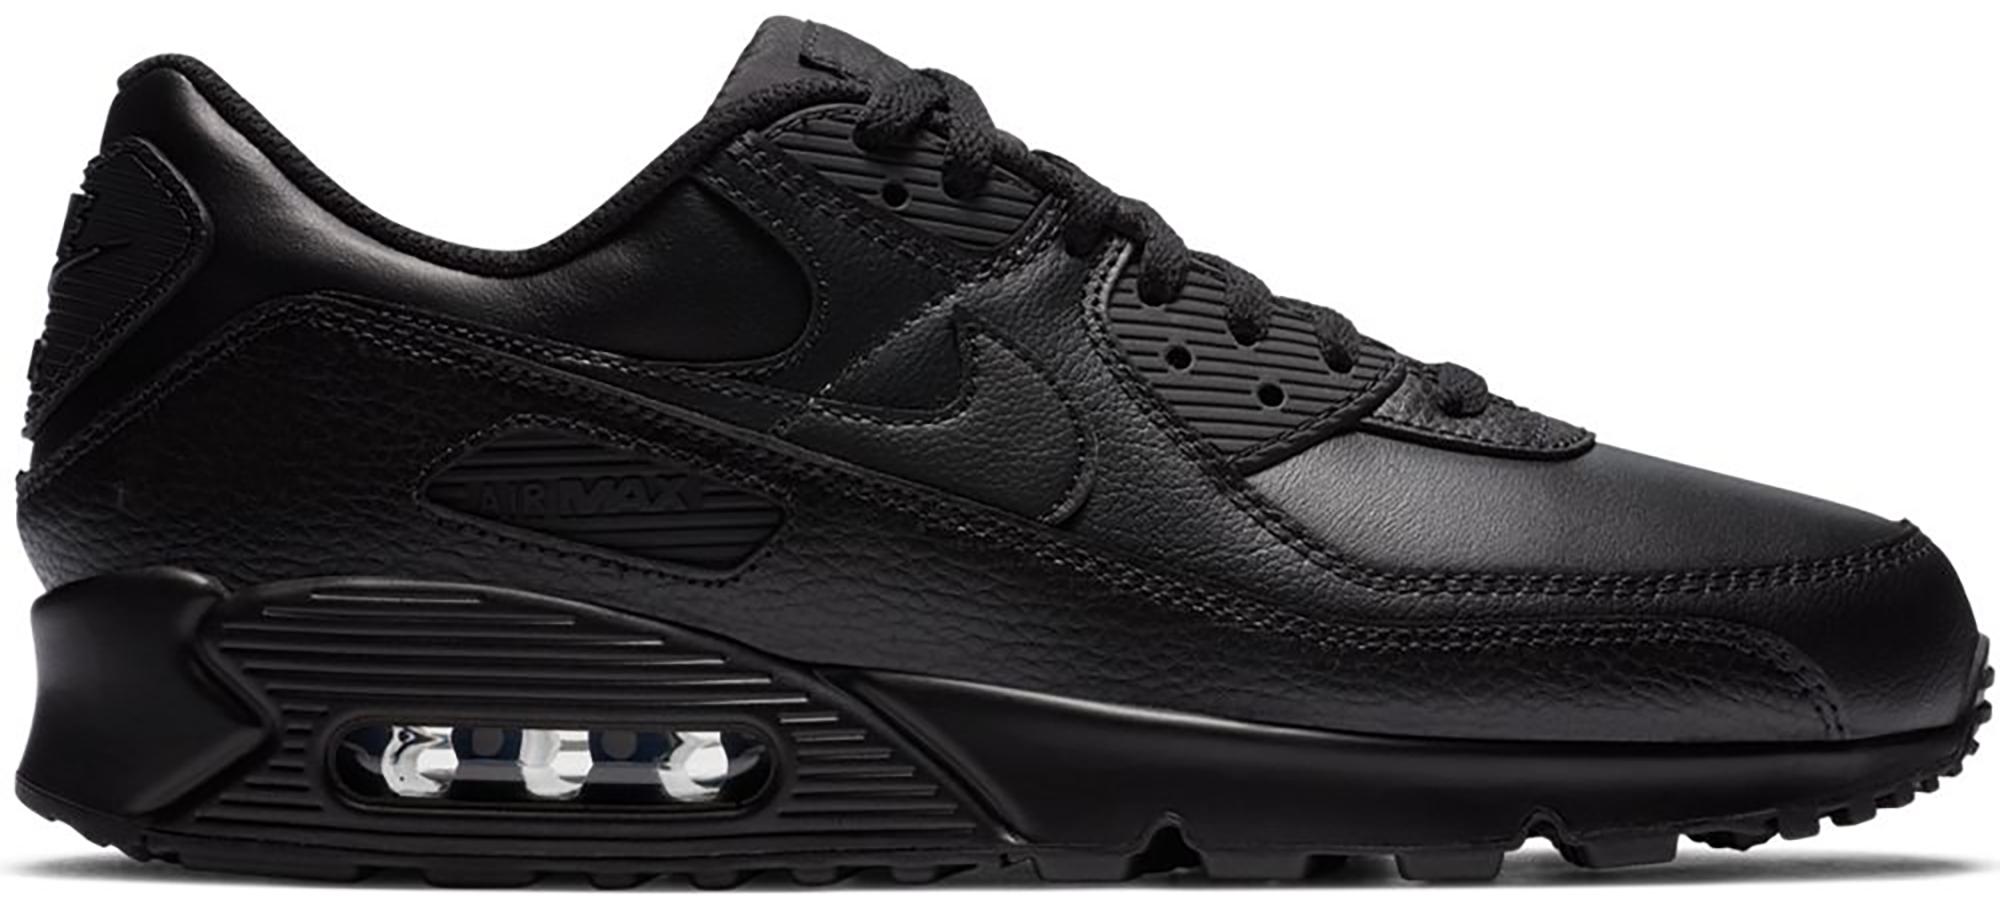 Nike Air Max 90 Leather Triple Black